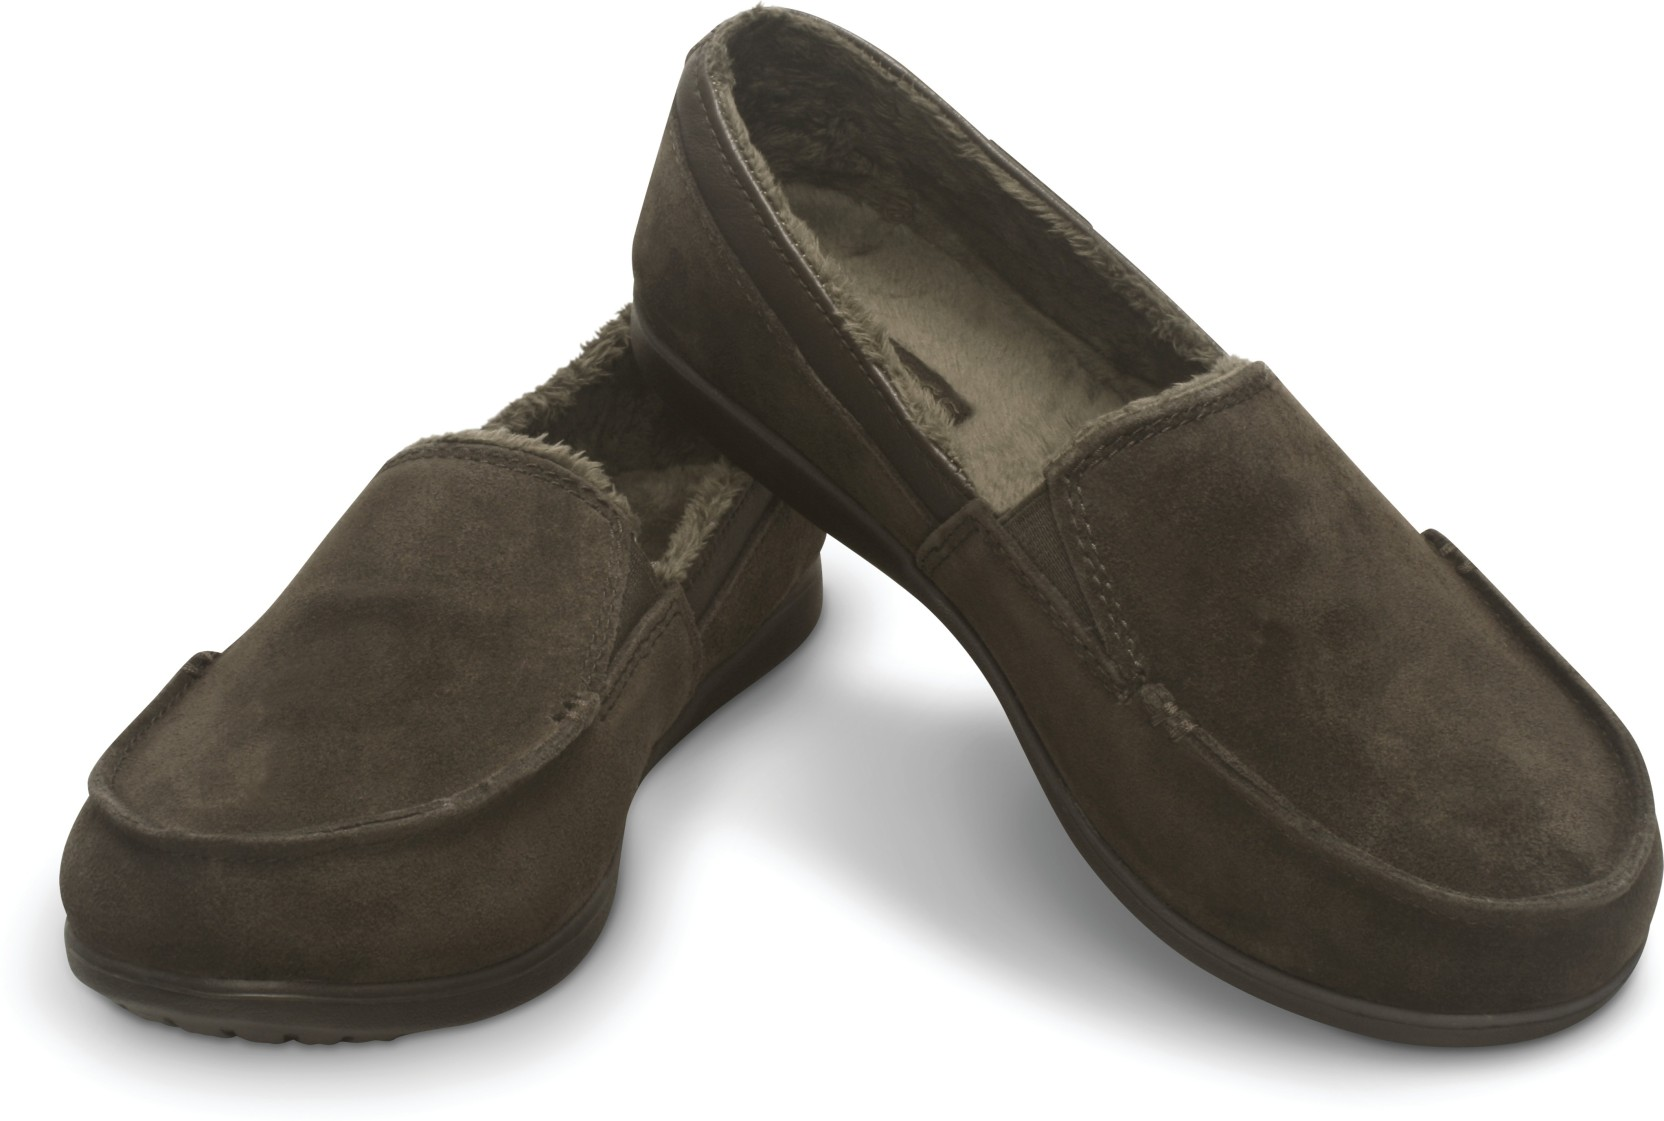 58cddfab8c Crocs Melbourne Suede Loafers For Women - Buy Brown Color Crocs ...